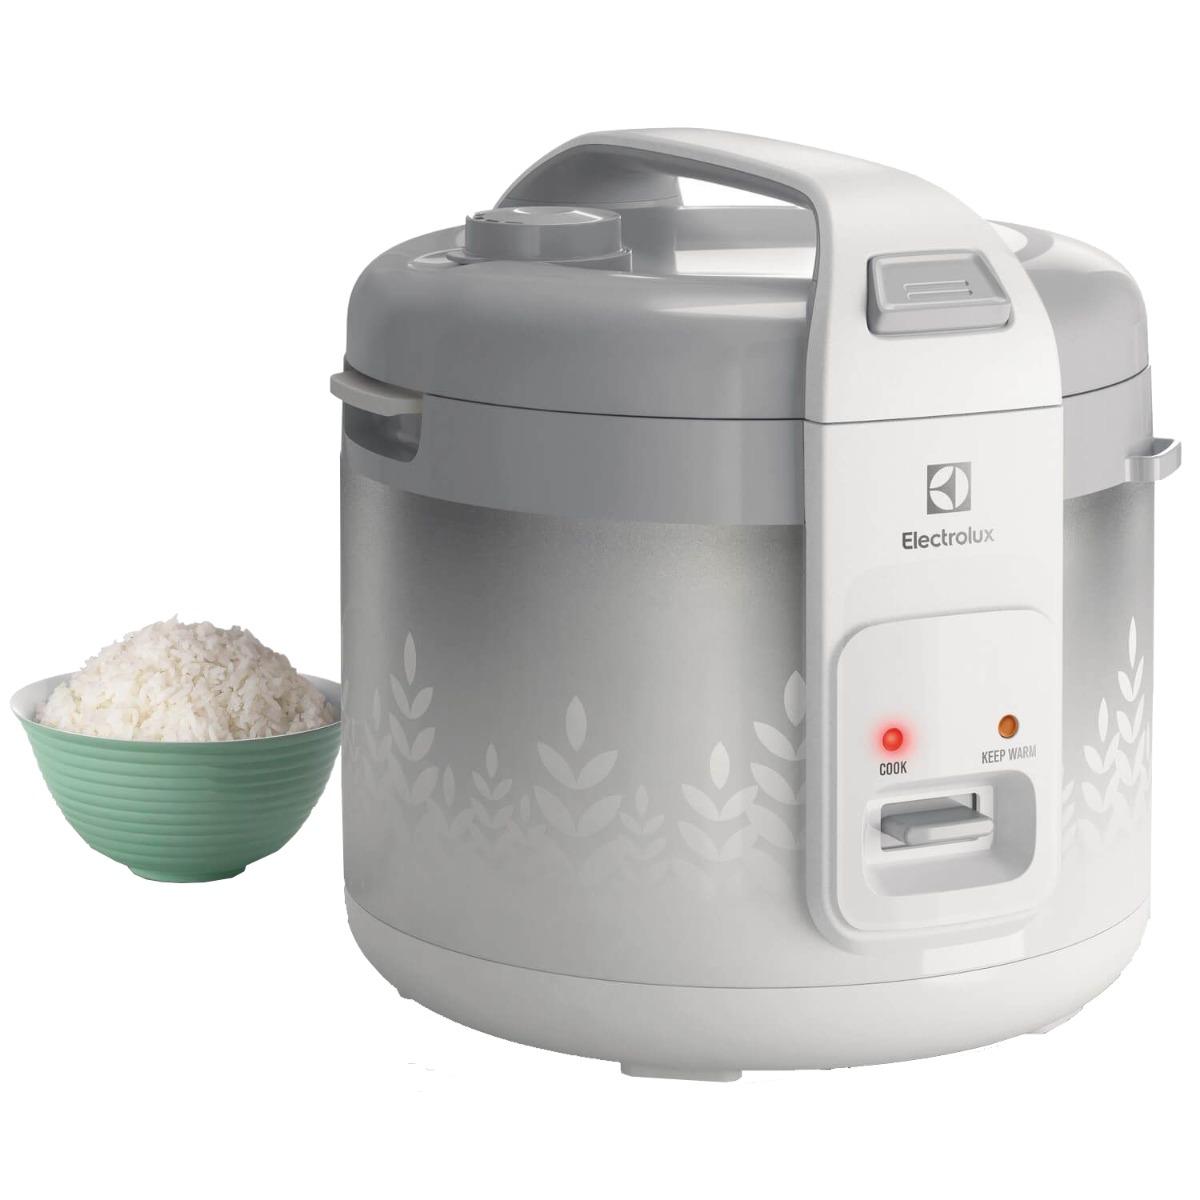 Electrolux Rice Cooker (1.8 L) ERC3305